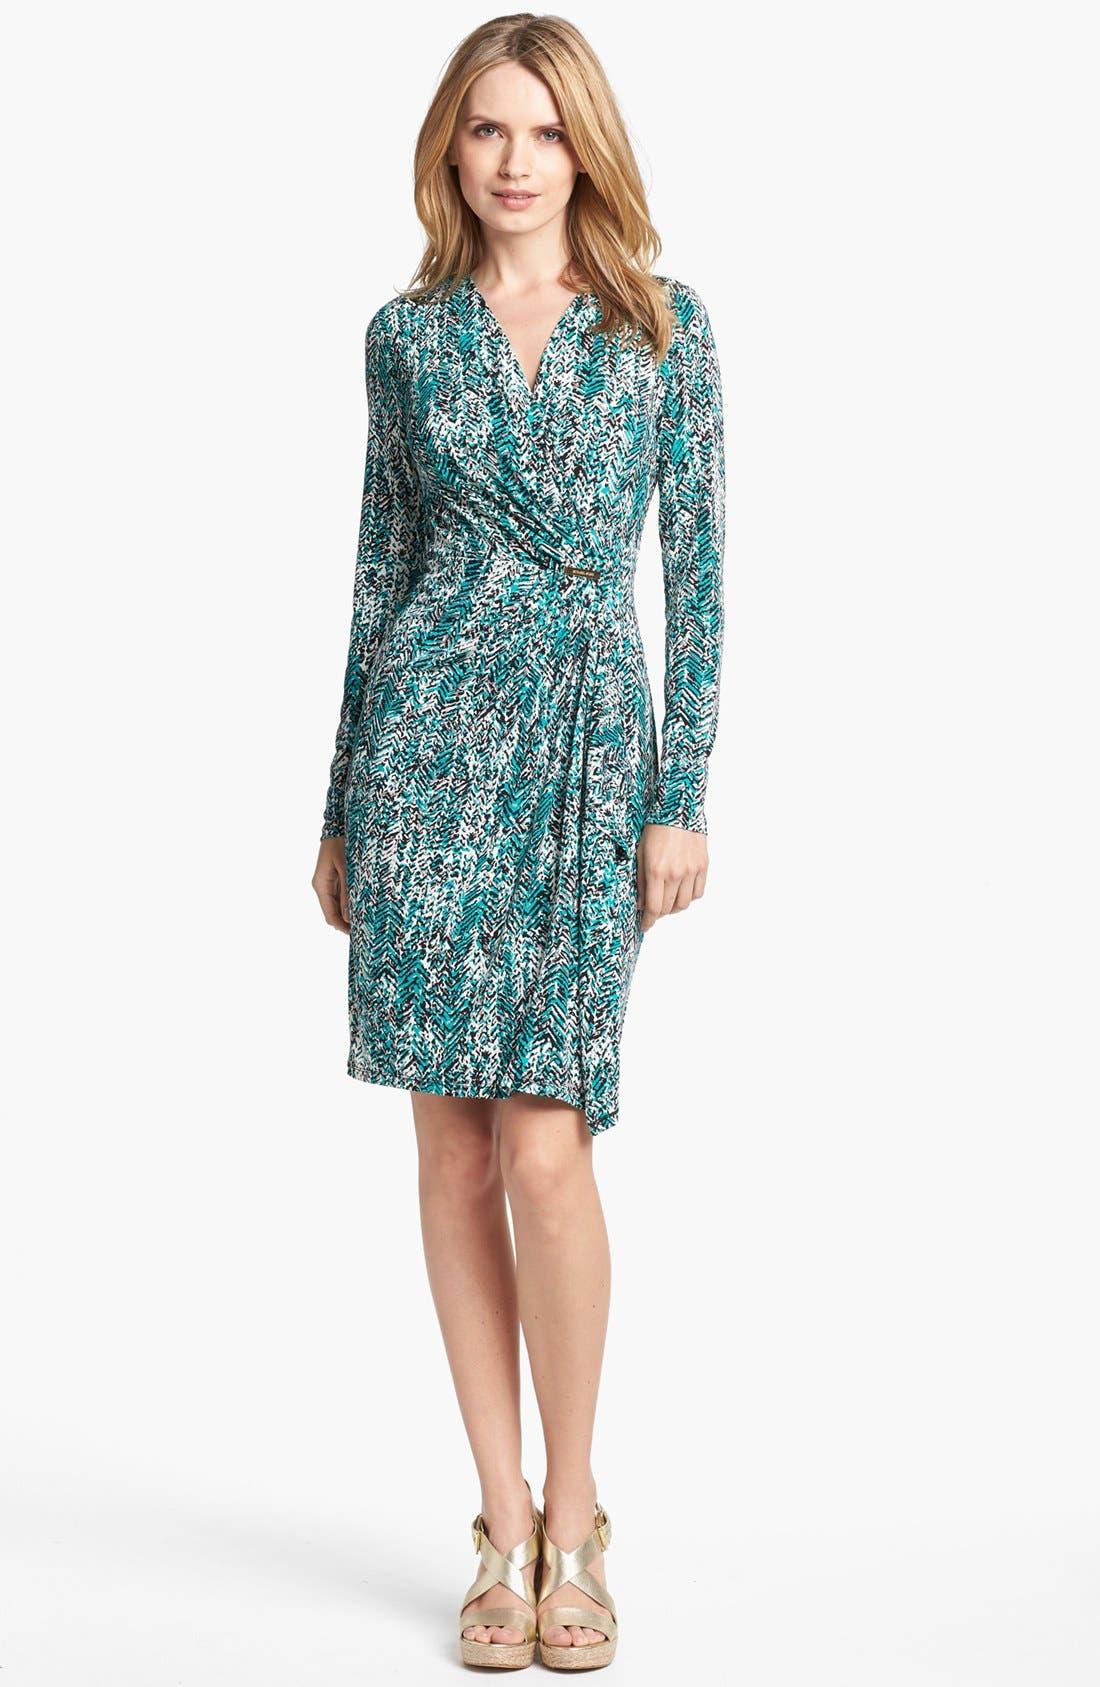 Alternate Image 1 Selected - MICHAEL Michael Kors Print Faux Wrap Dress